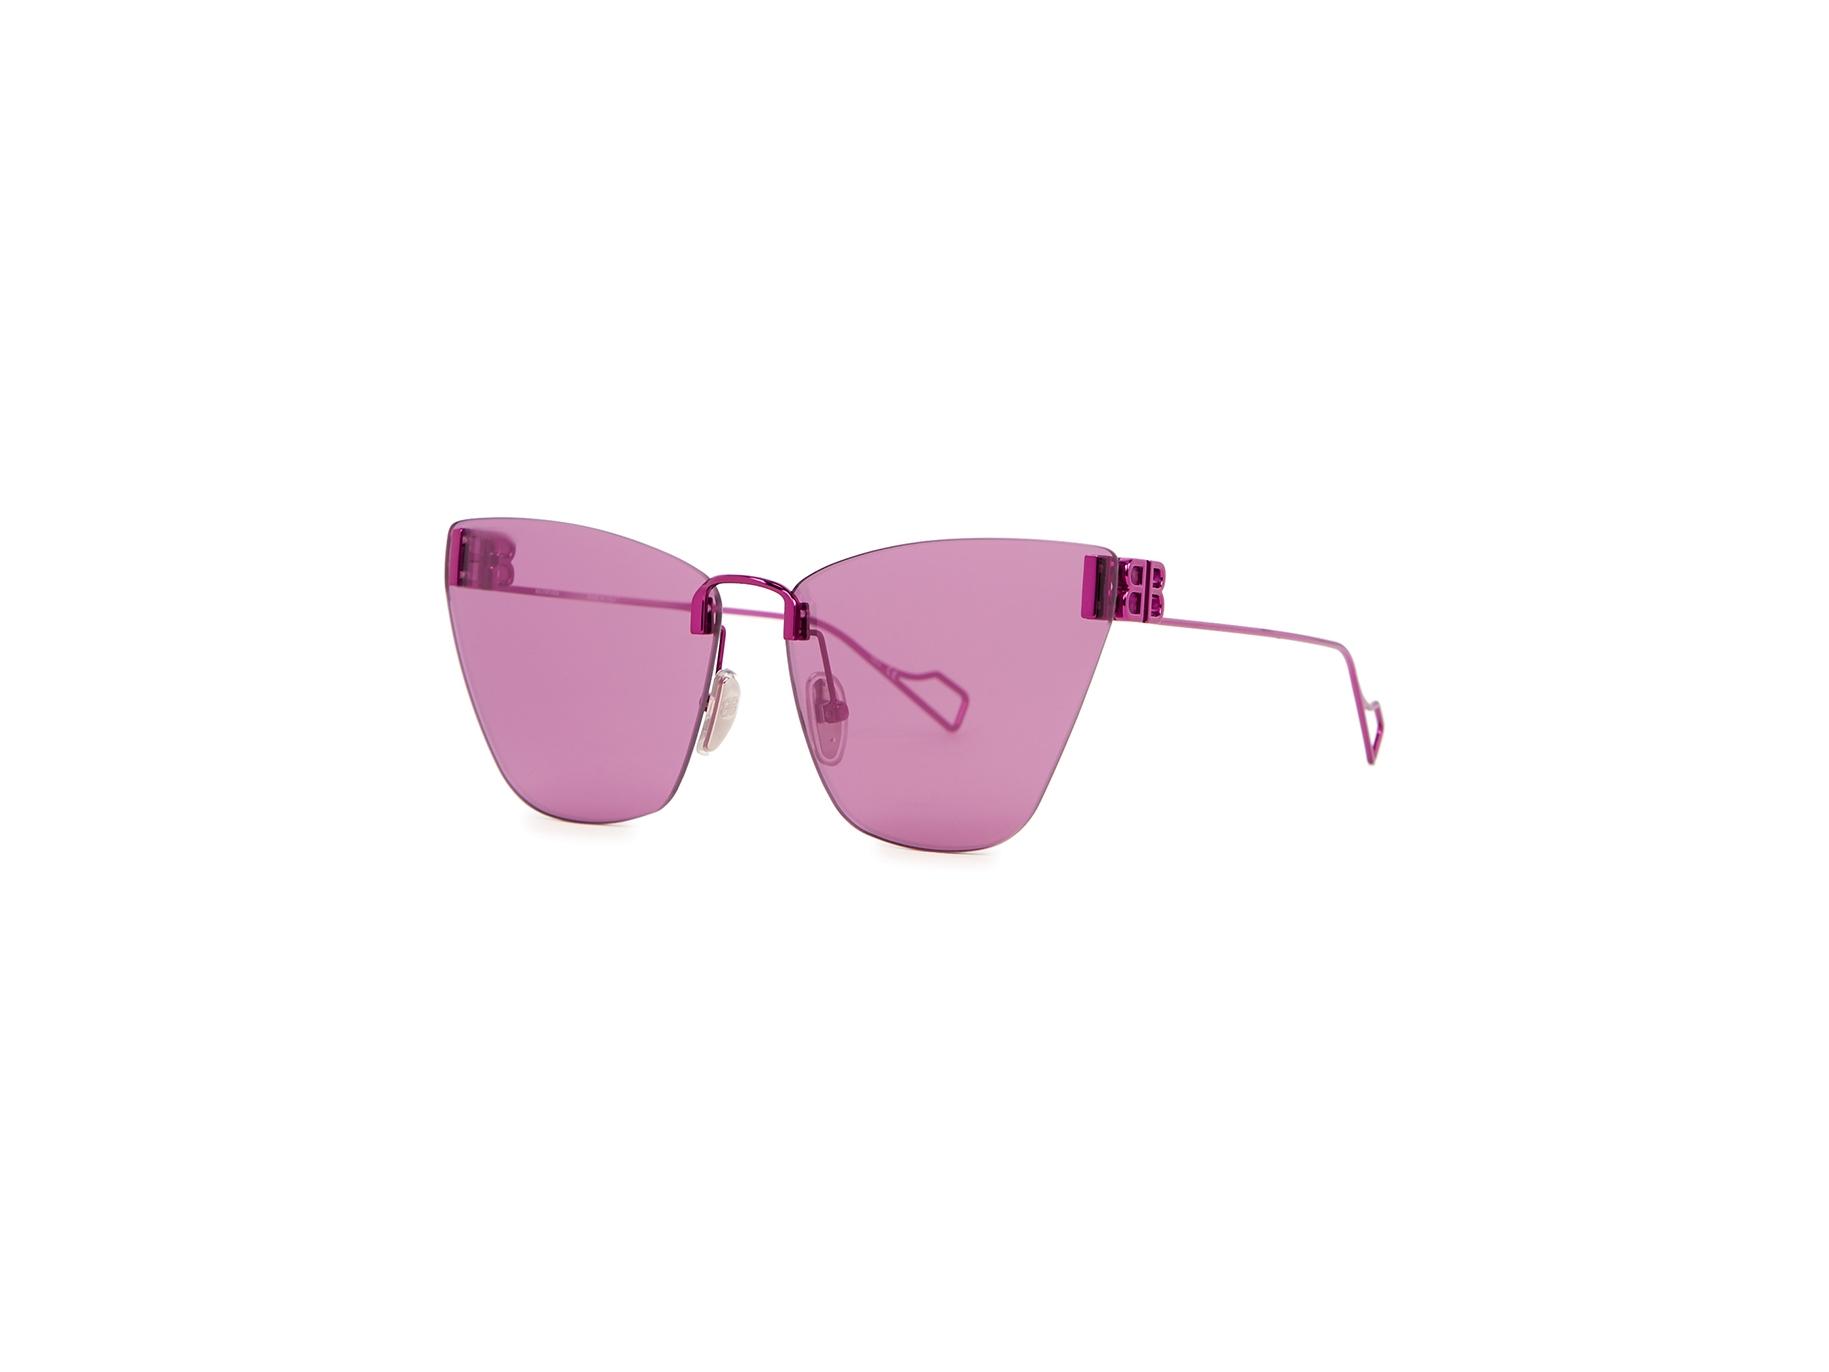 Balenciaga Purple Cat Eye Sunglasses Harvey Nichols